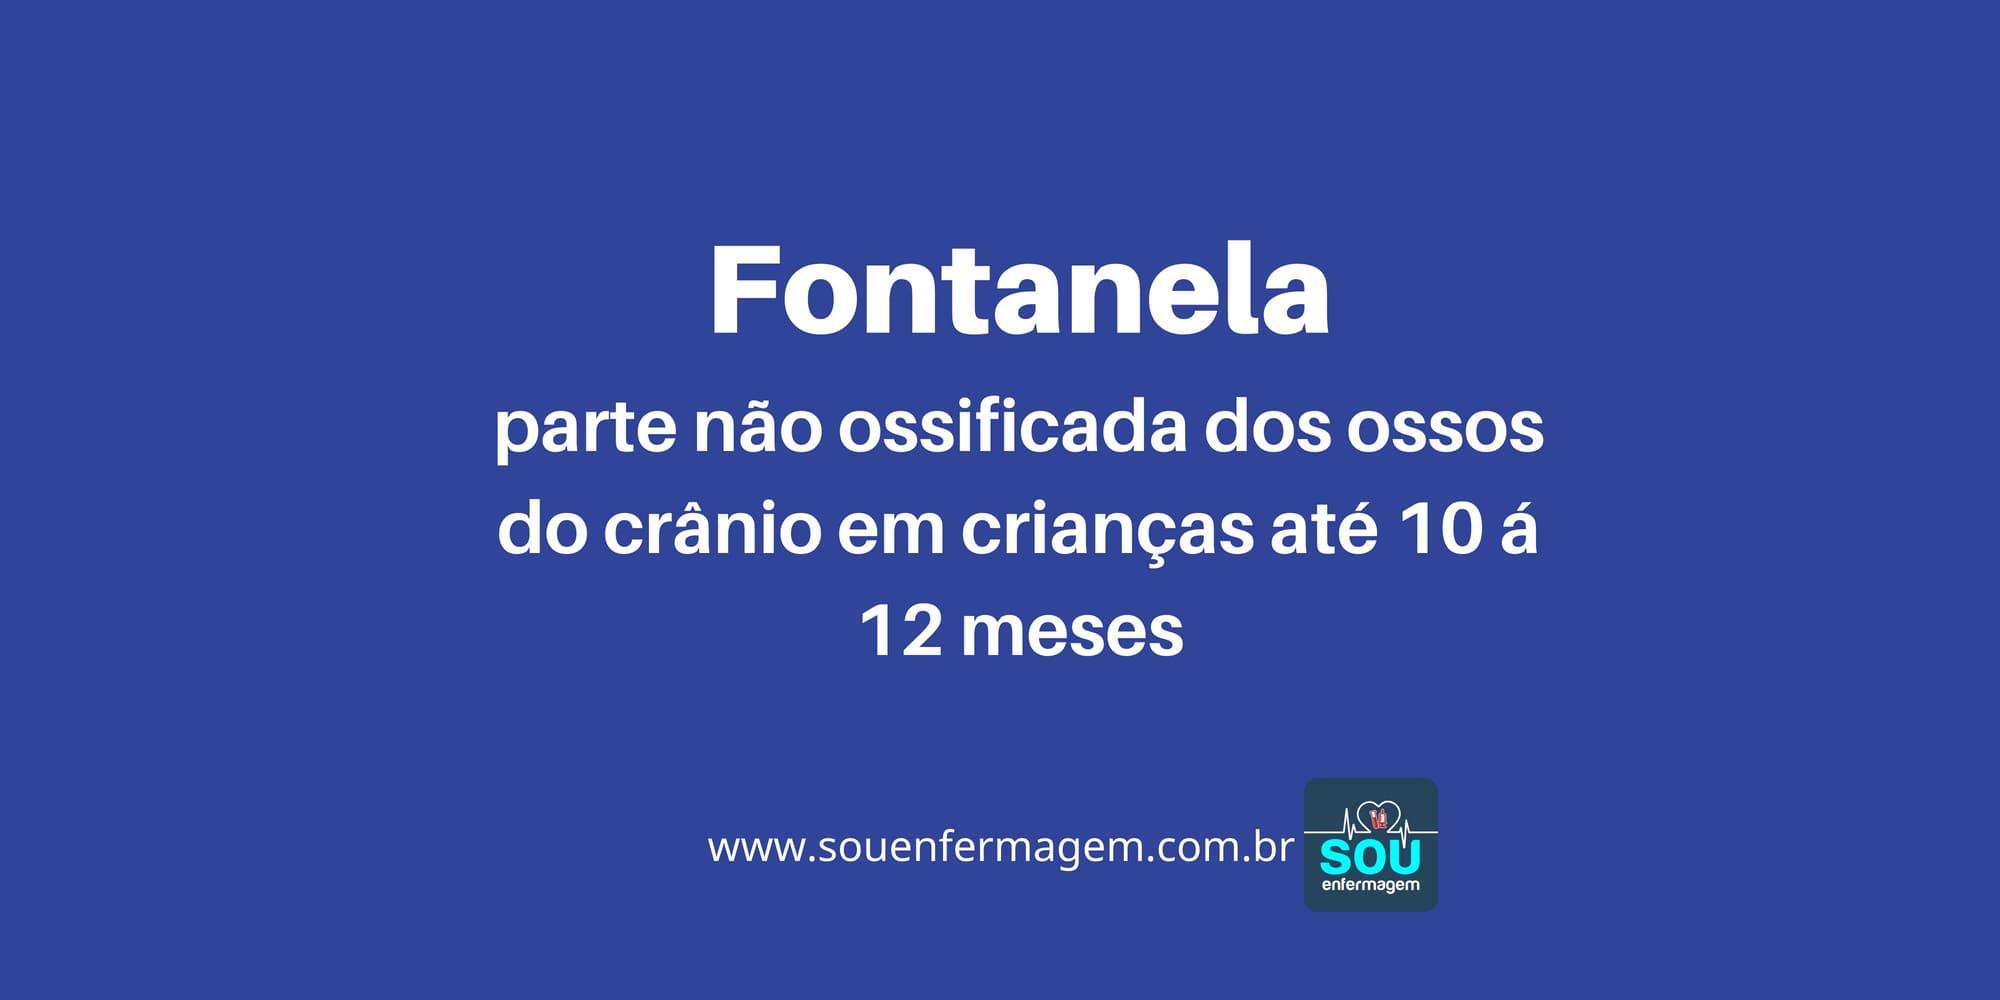 Fontanela.jpg